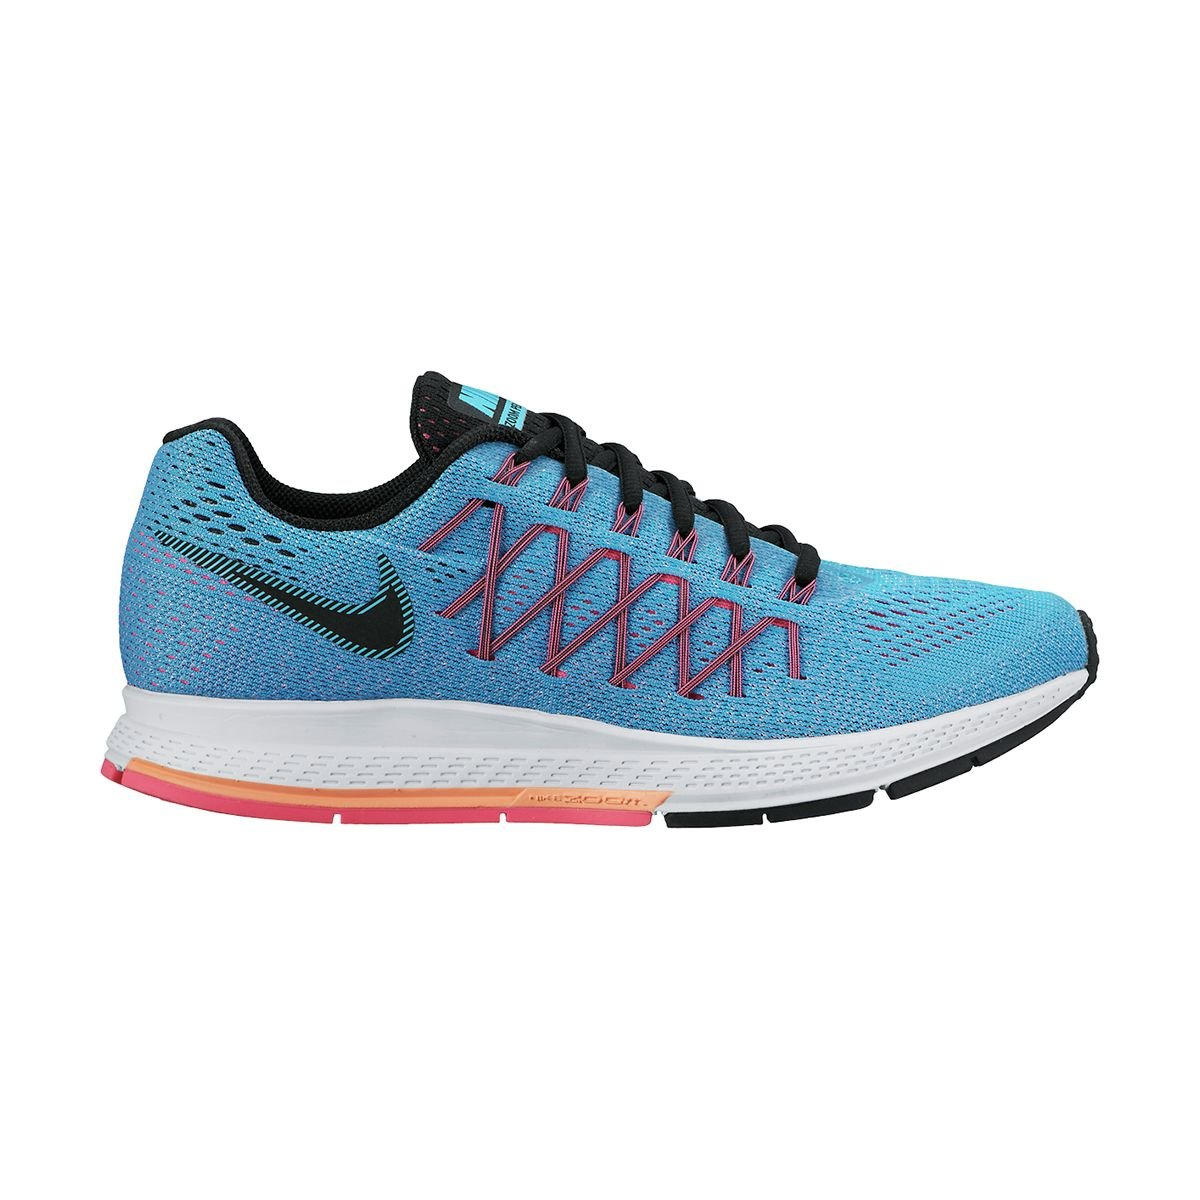 NIKE Women's Air Zoom Pegasus 32 Running Shoe B00QFP3C2M 5 B/(M) US|Bl Lagoon/Blk/Snst Glw/Pnk Pw